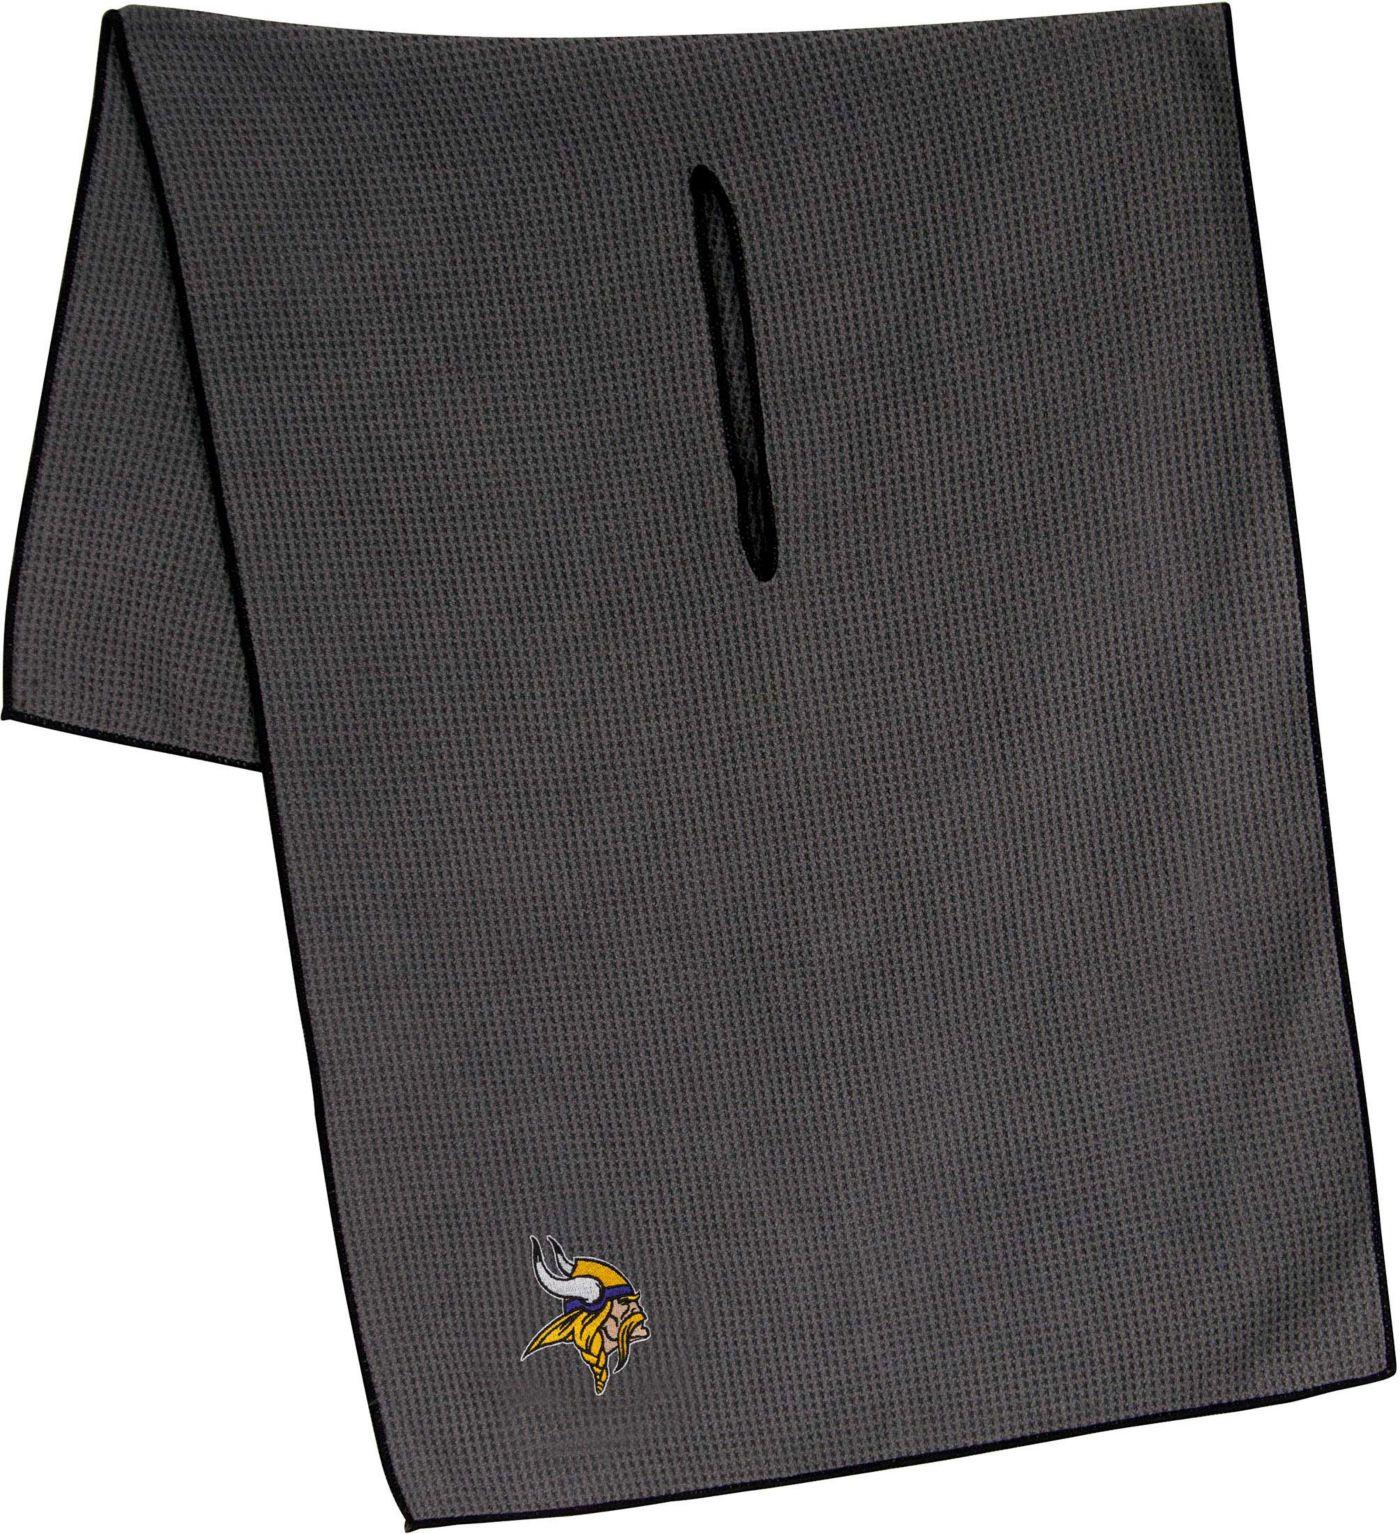 "Team Effort Minnesota Vikings 19"" x 41"" Microfiber Golf Towel"